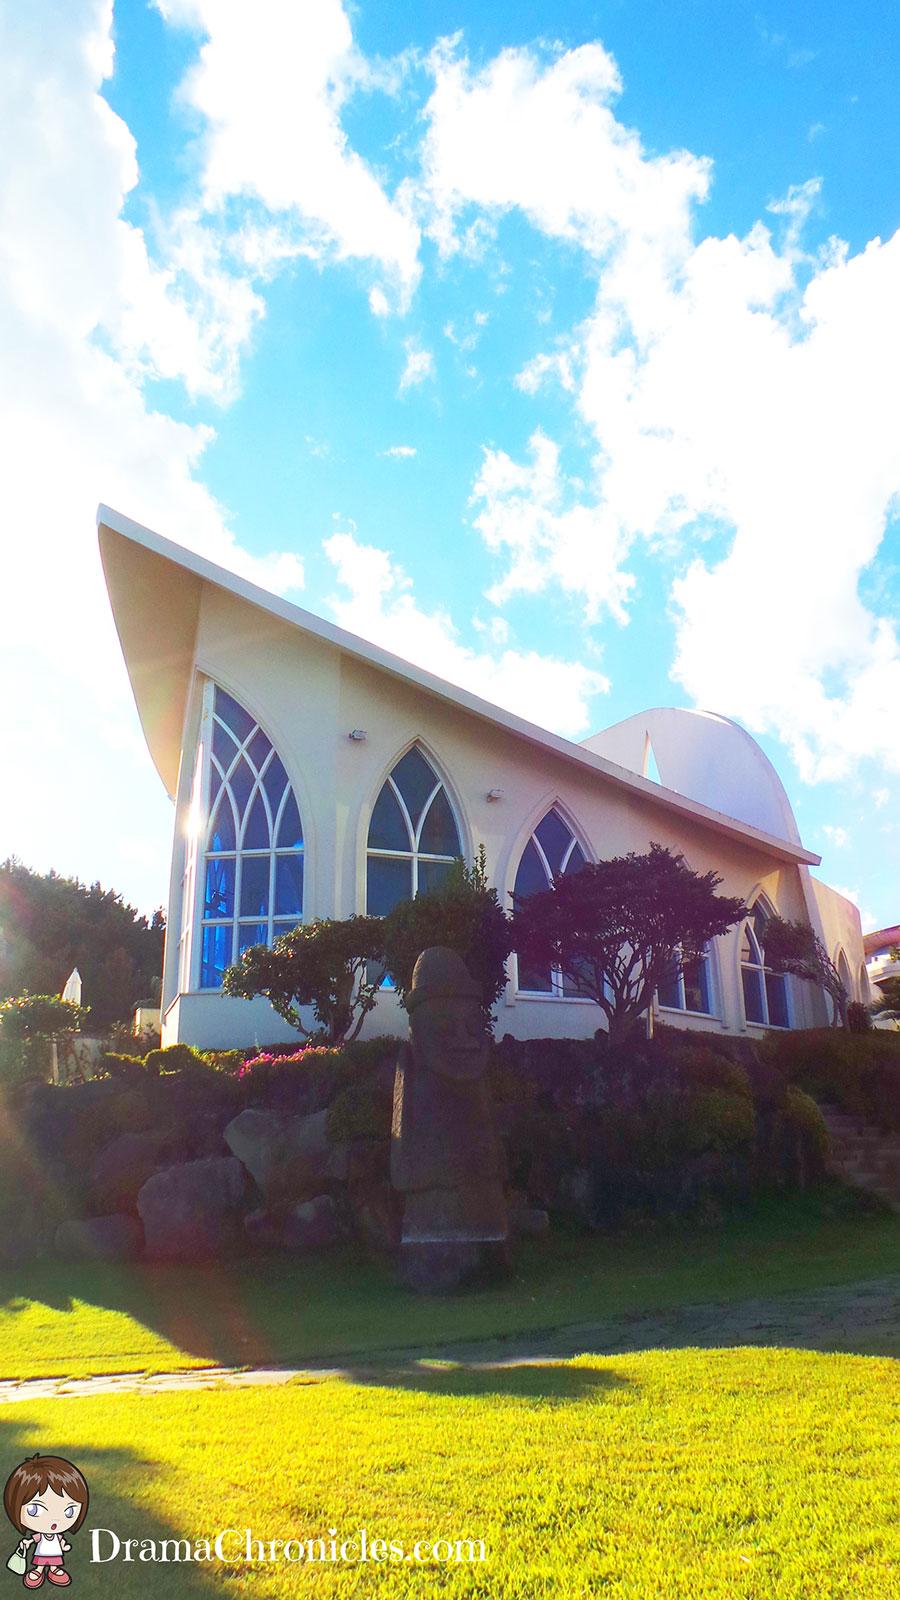 hyatt-regency-chapel-07-drama-chronicles